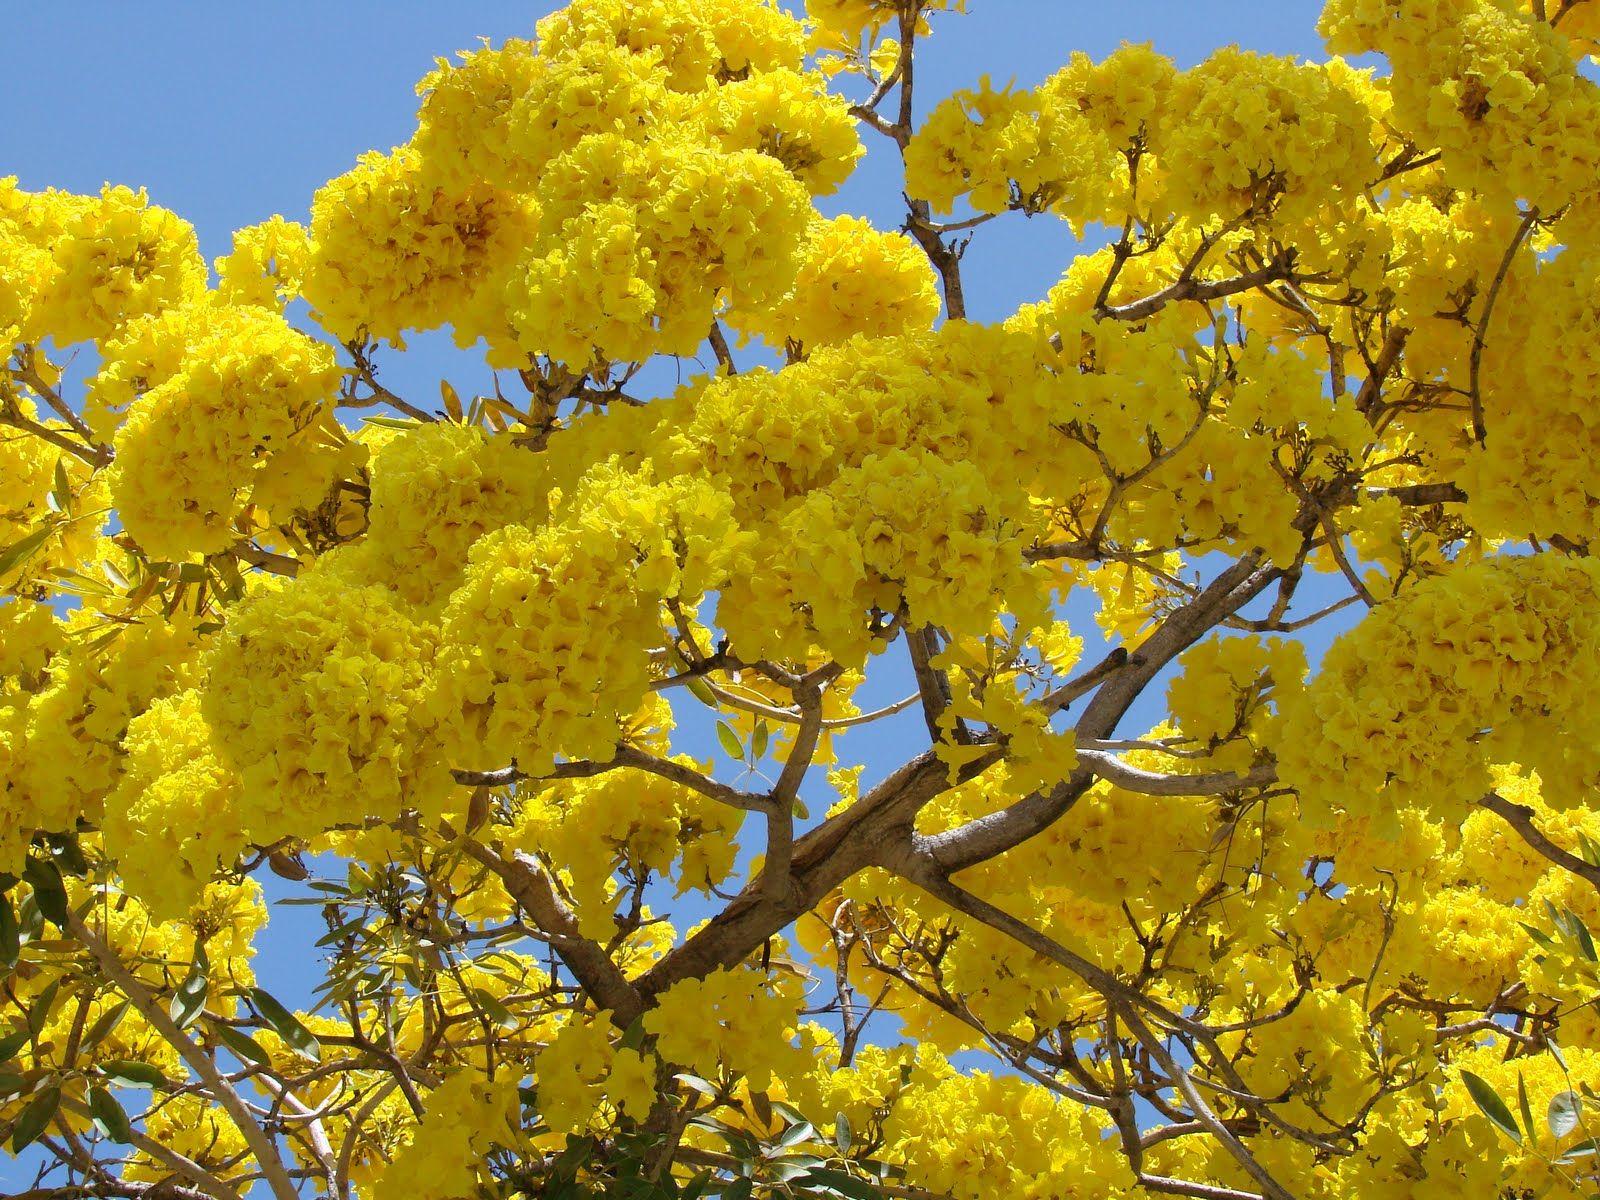 Angelil adventures whats that neonyellow tree yellow